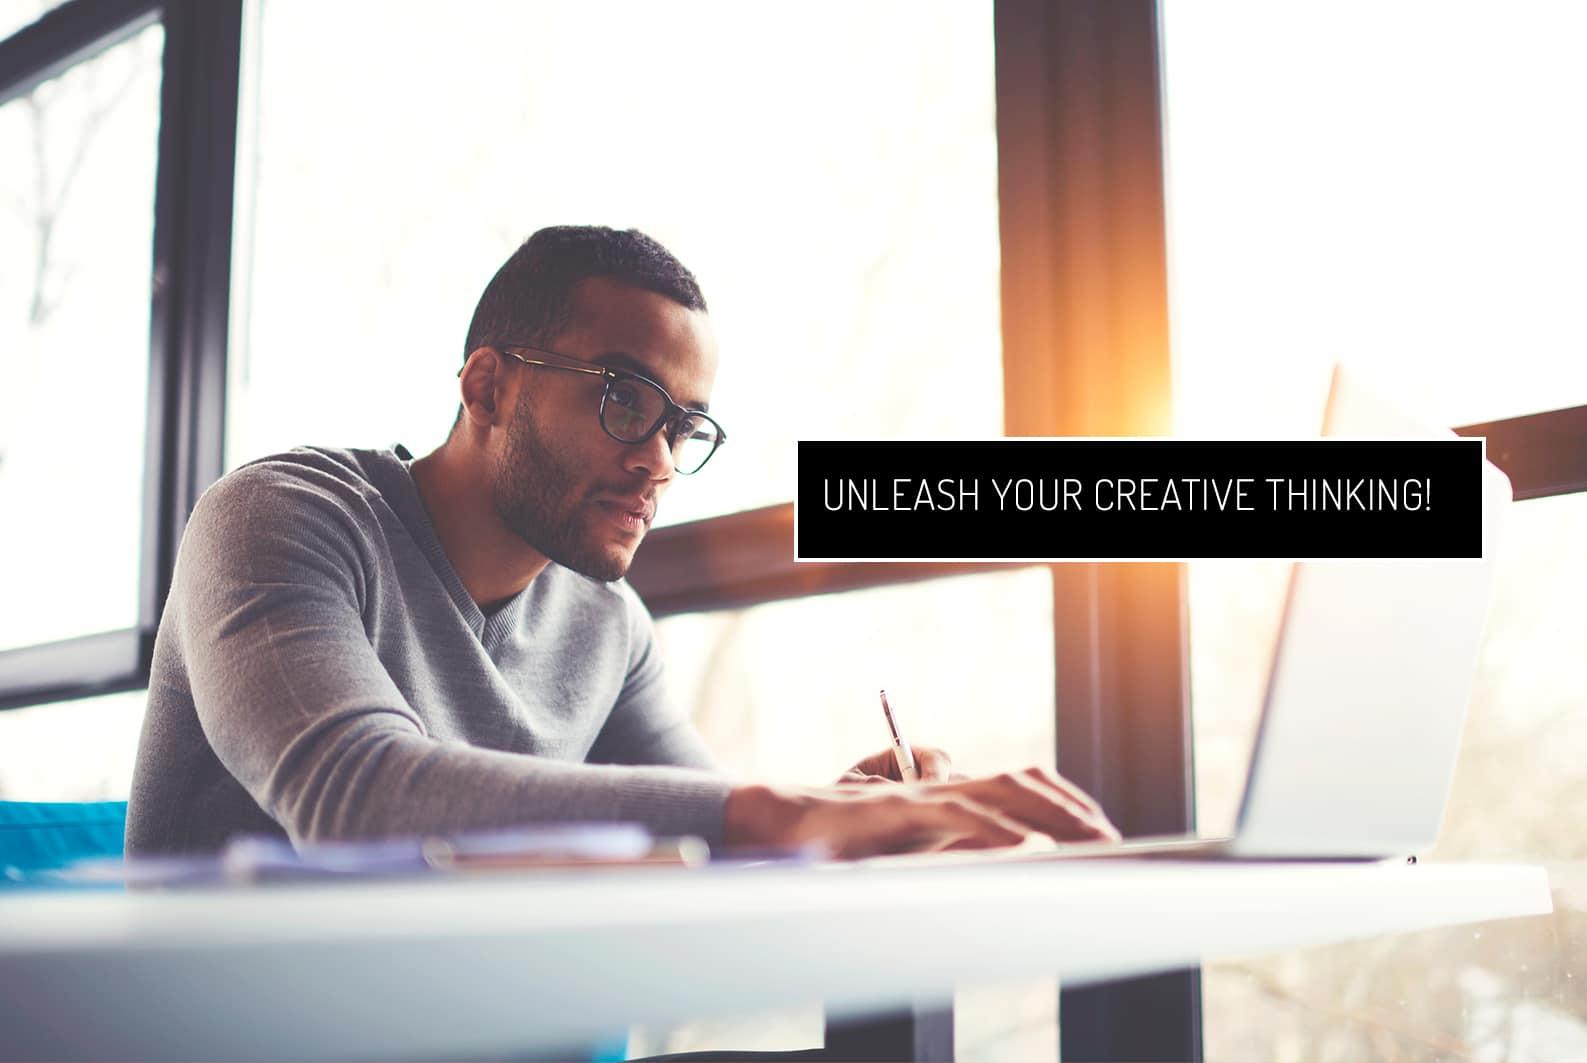 Unleash Your Creative Thinking